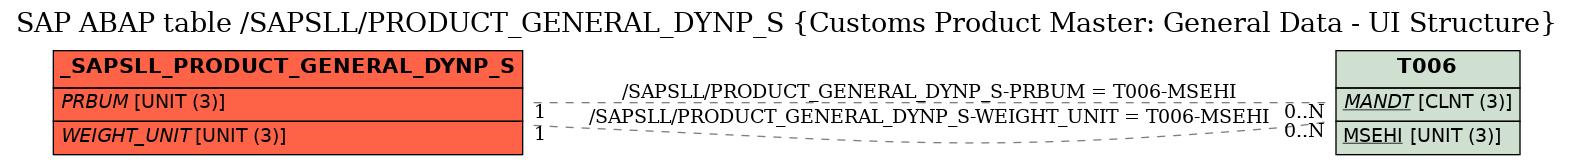 SAP ABAP Table /SAPSLL/PRODUCT_GENERAL_DYNP_S (Customs